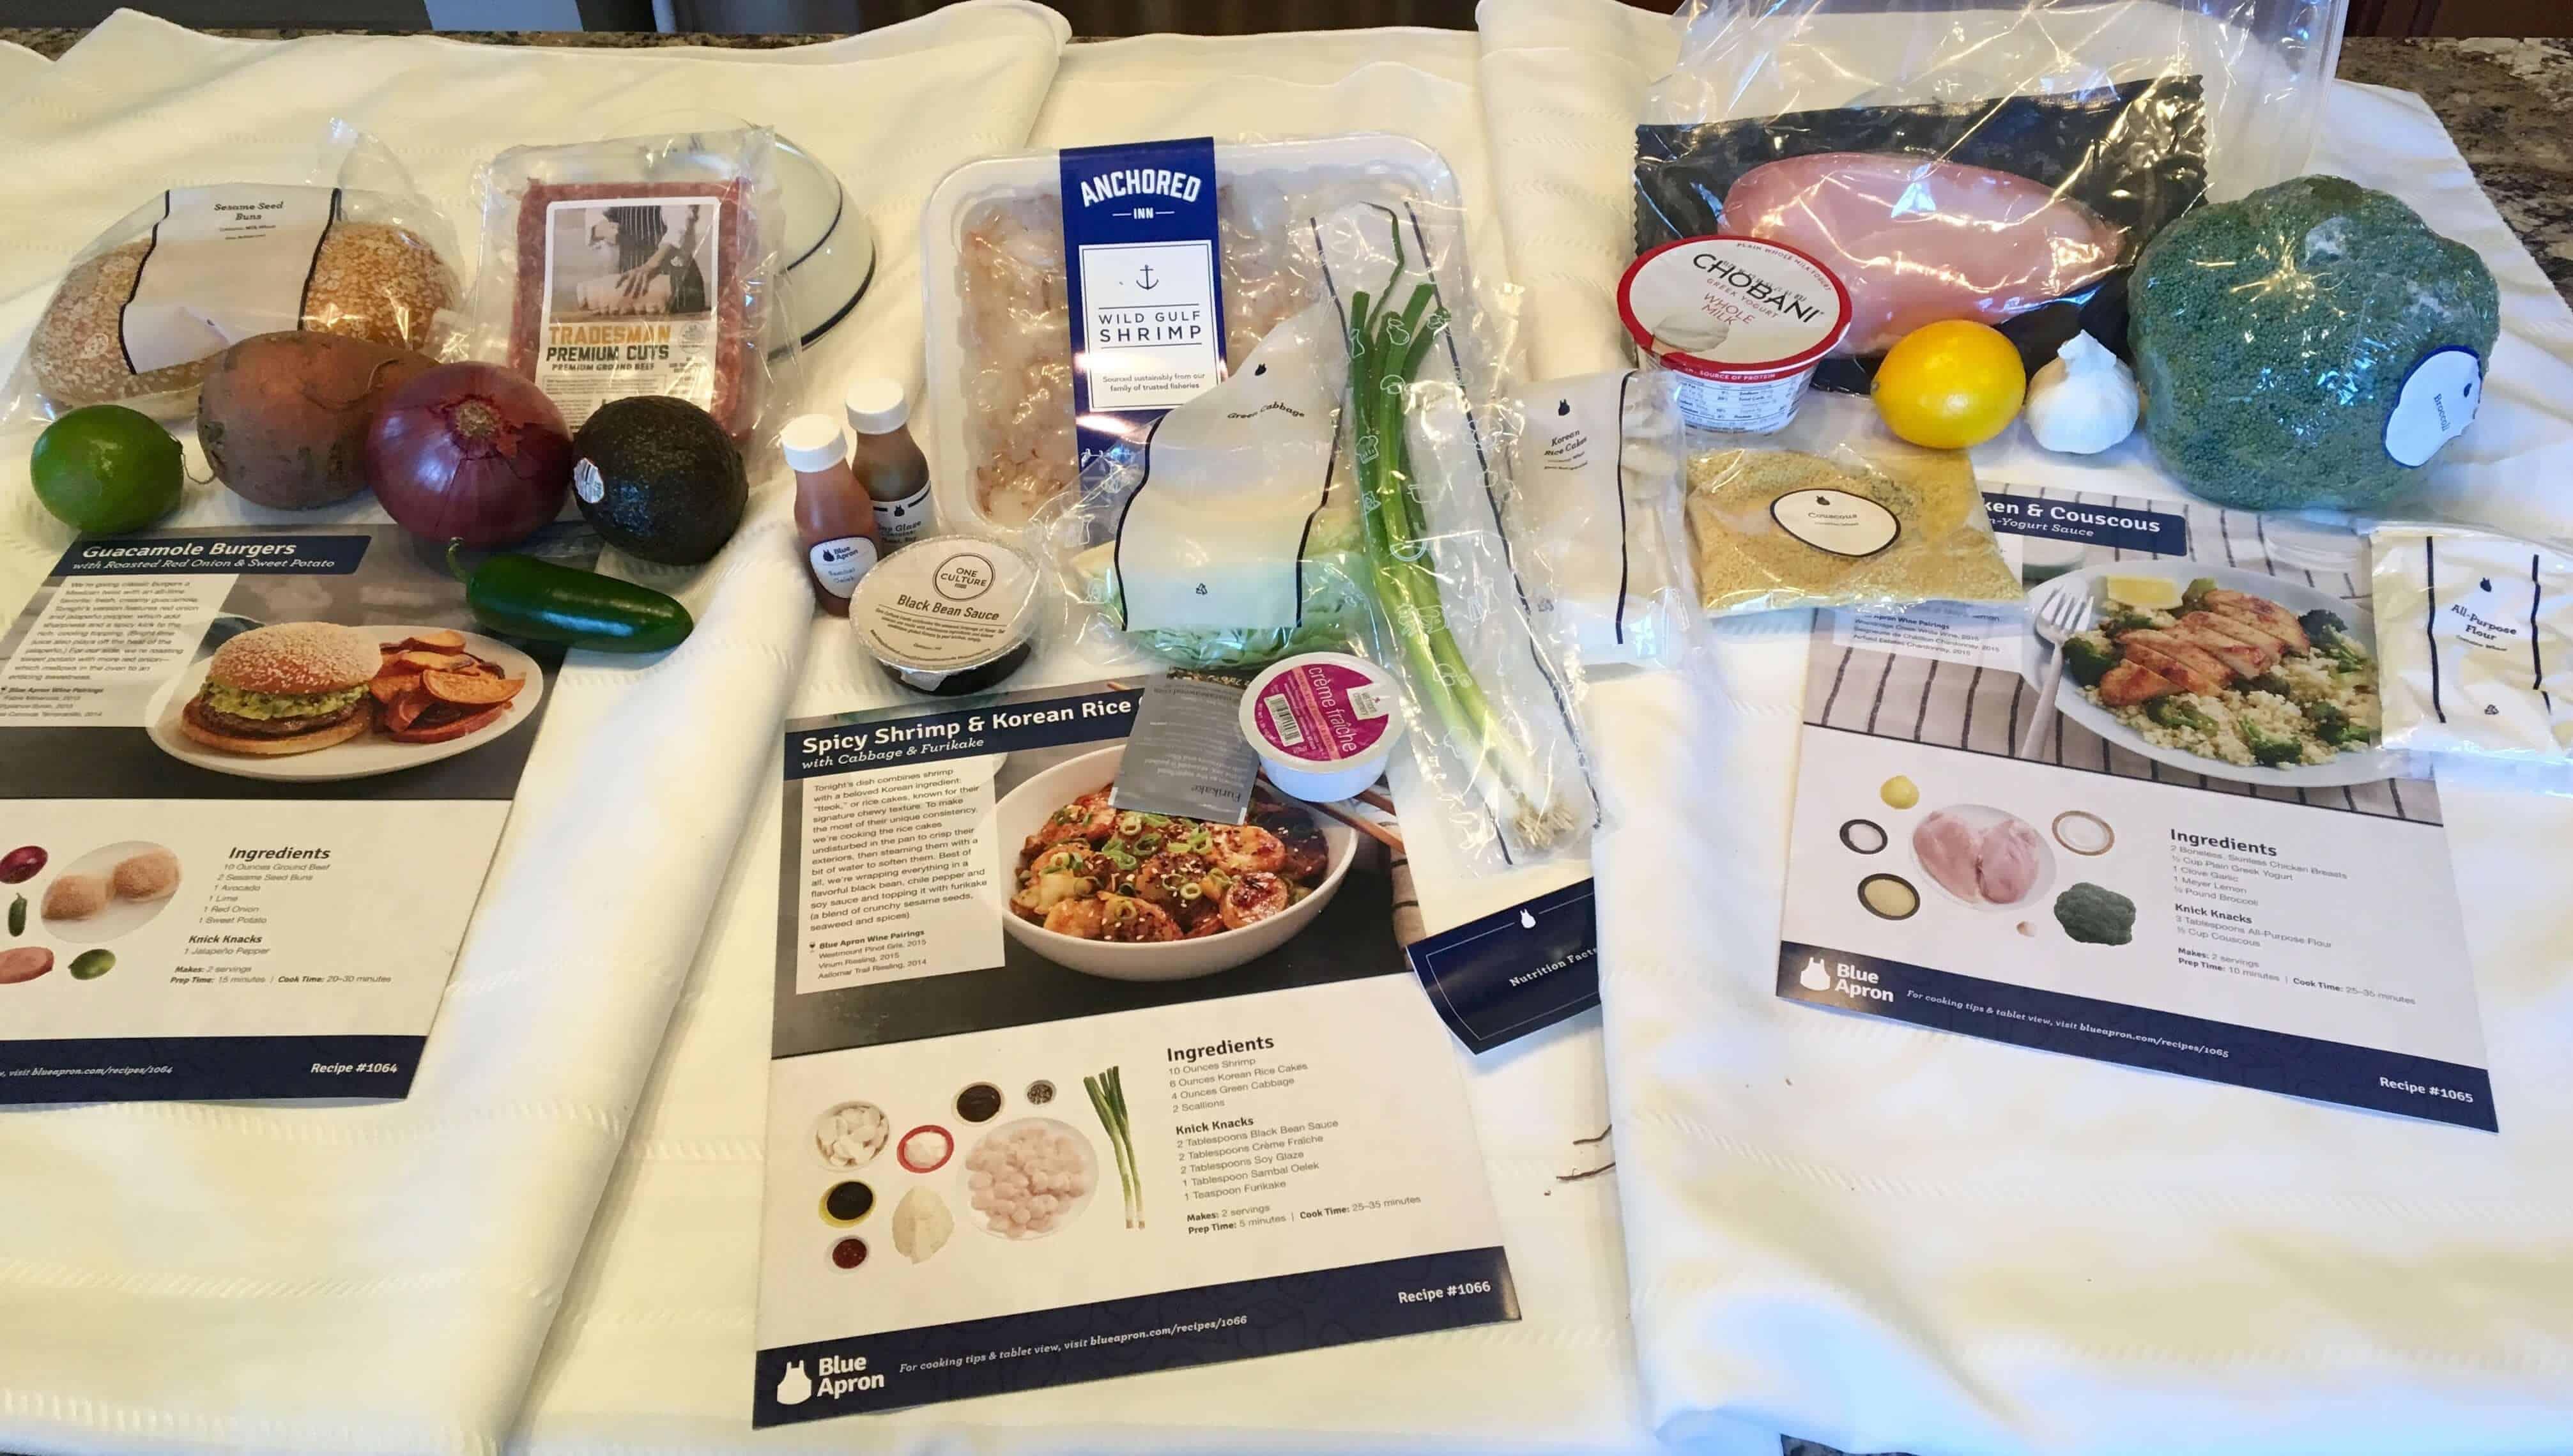 Blue apron breakfast - Blue Apron Breakfast 19